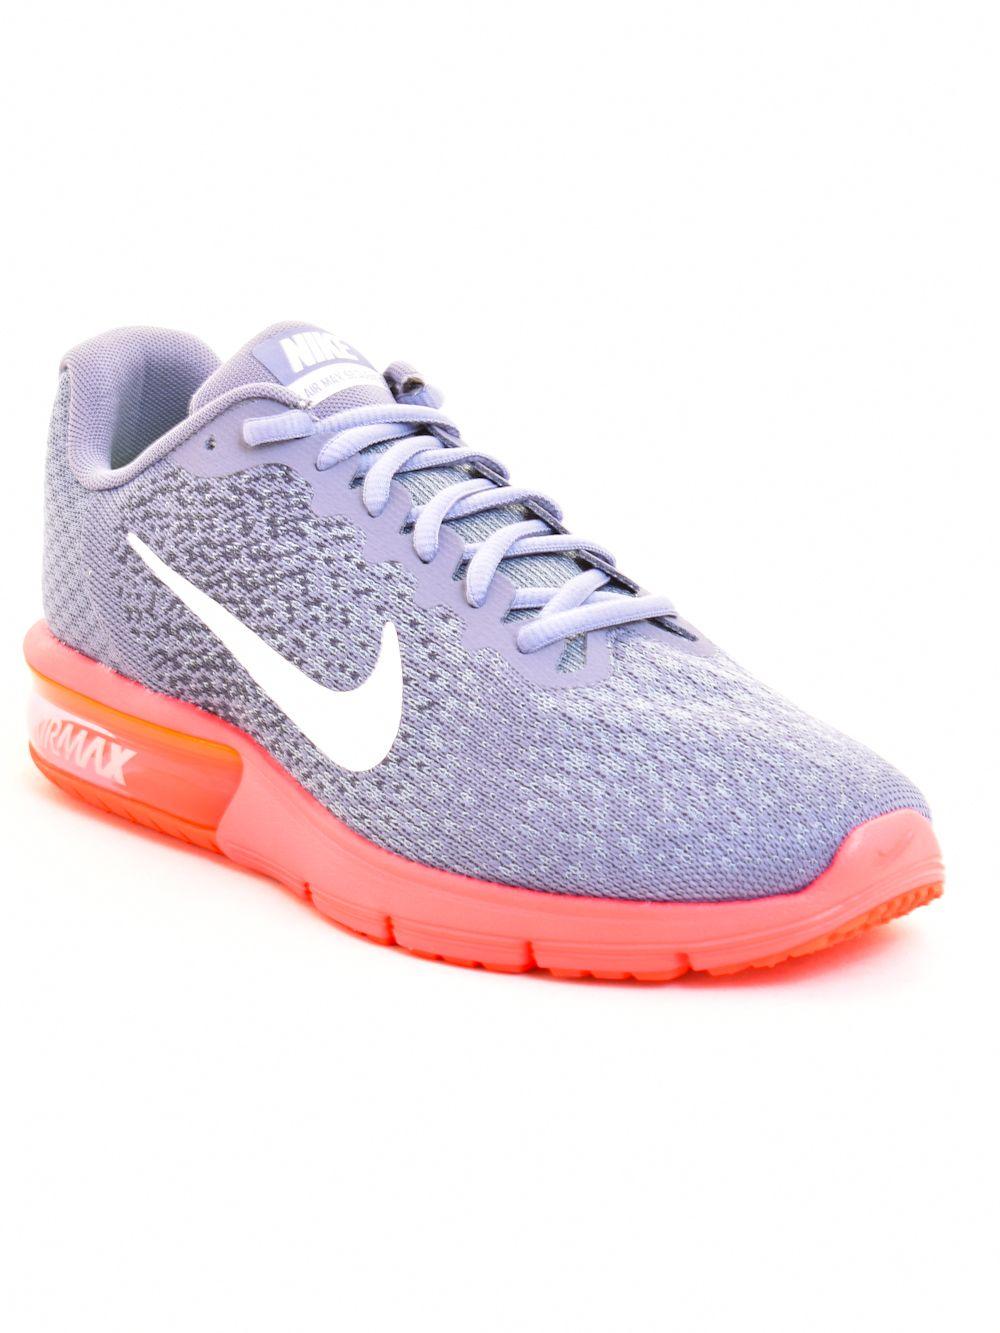 9b0c107129 Női - Cipő - Sportcipő Adidas, Nike - 41   Márkásbolt.hu